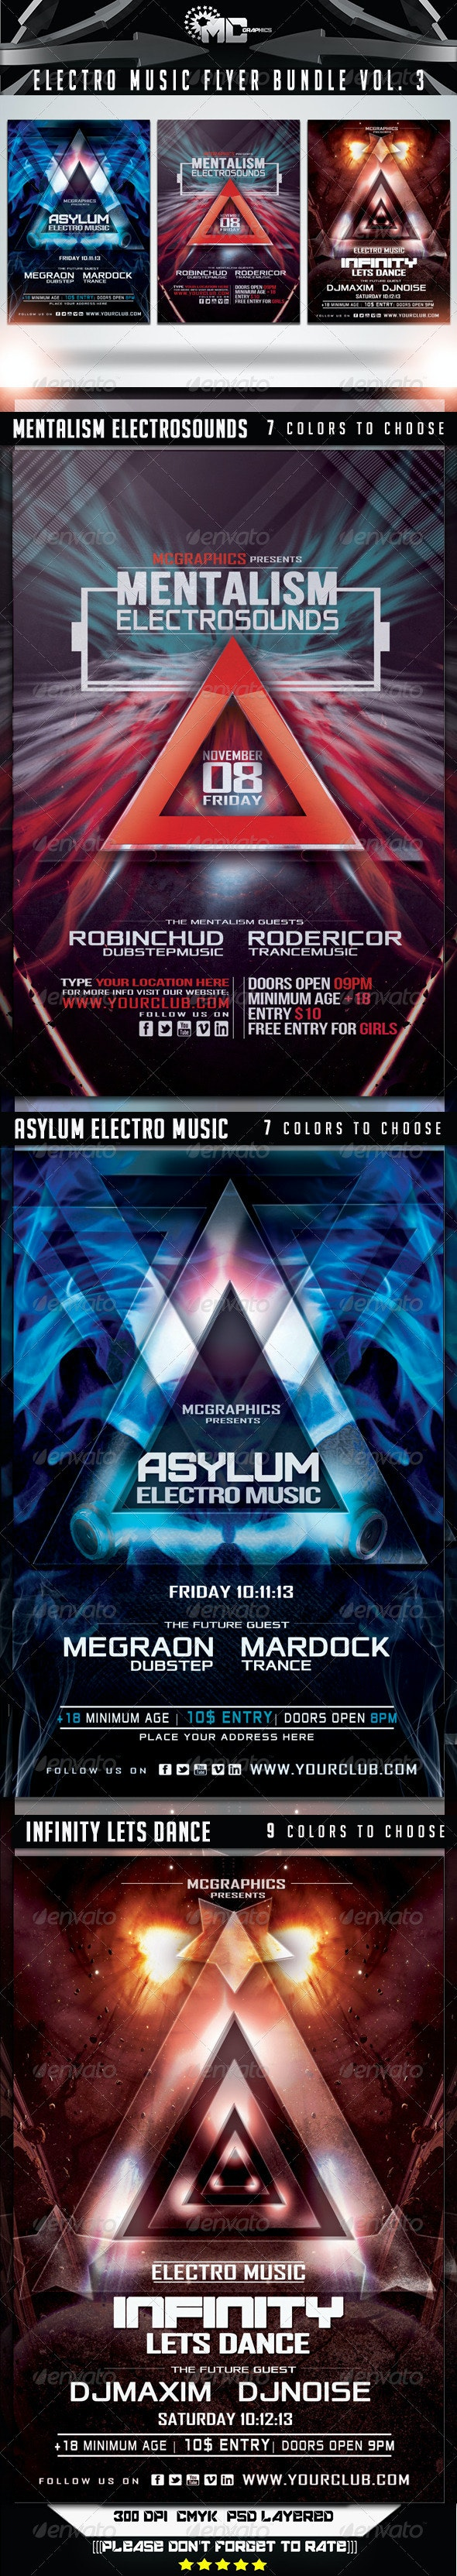 Electro Music Flyer Bundle Vol. 3 - Clubs & Parties Events